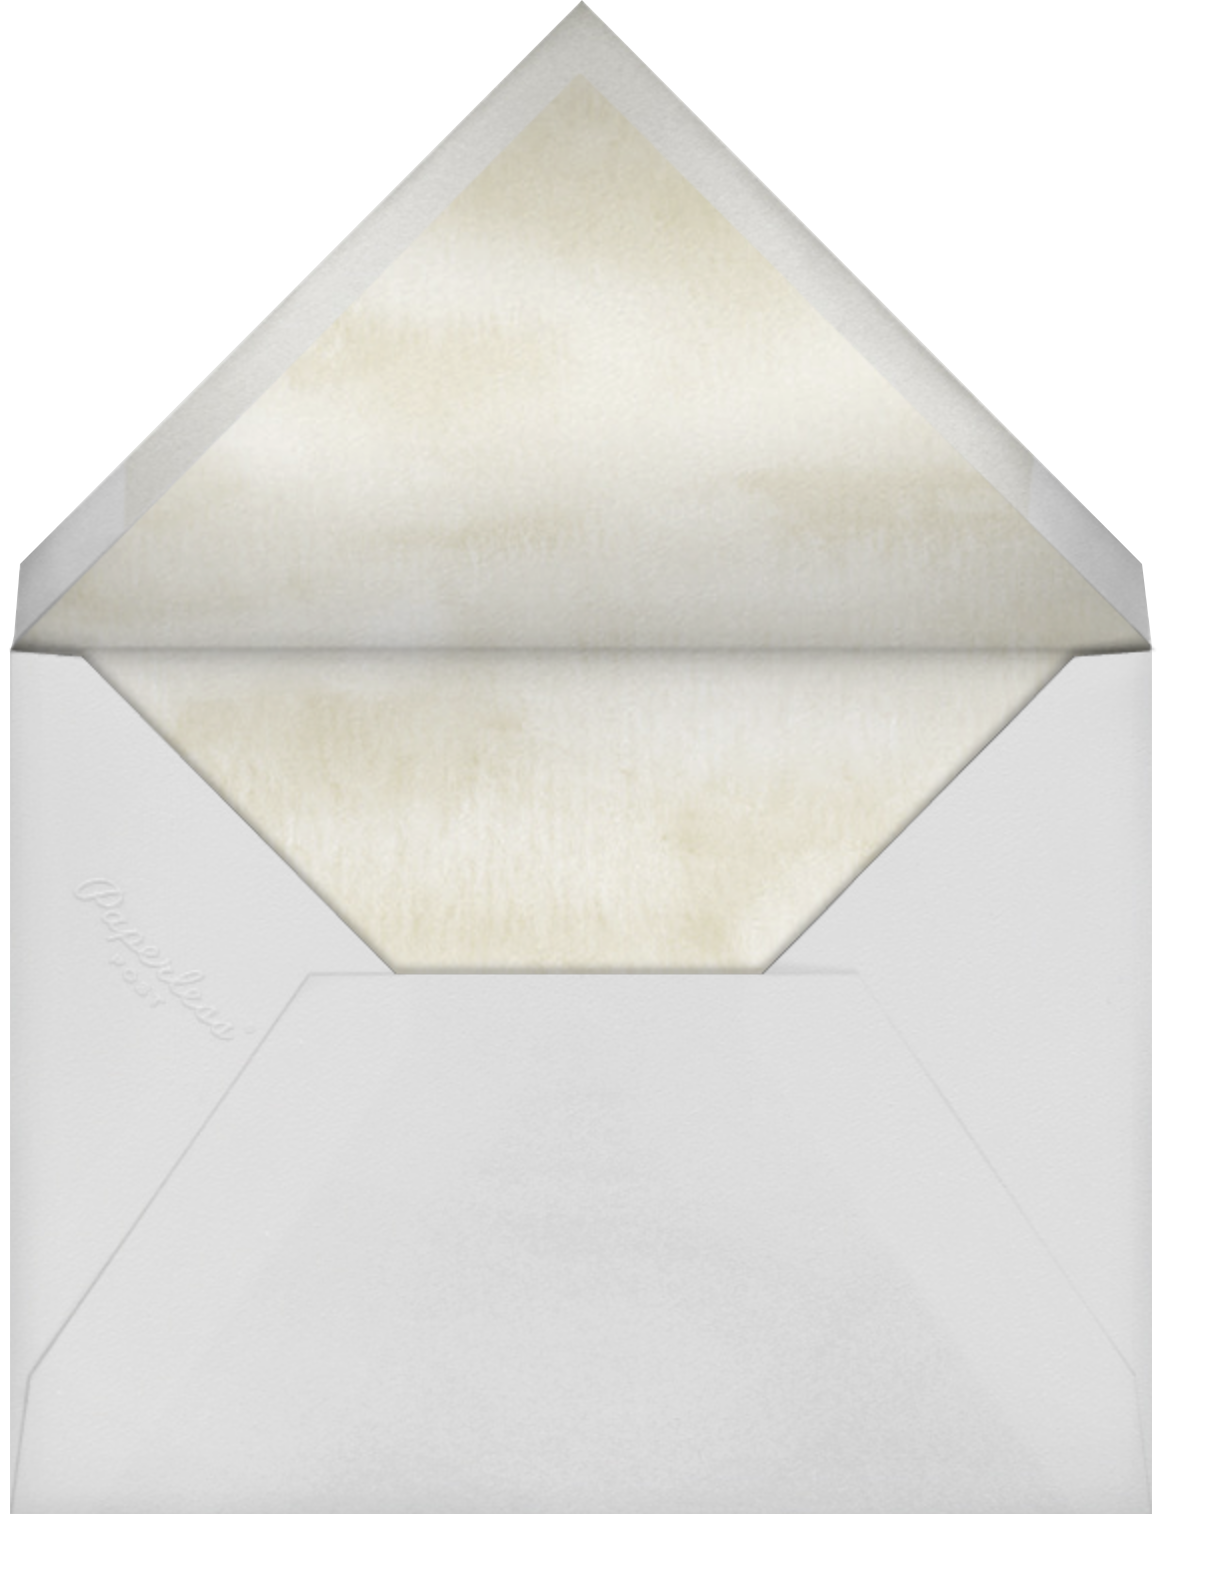 Muguet - Felix Doolittle - Engagement party - envelope back